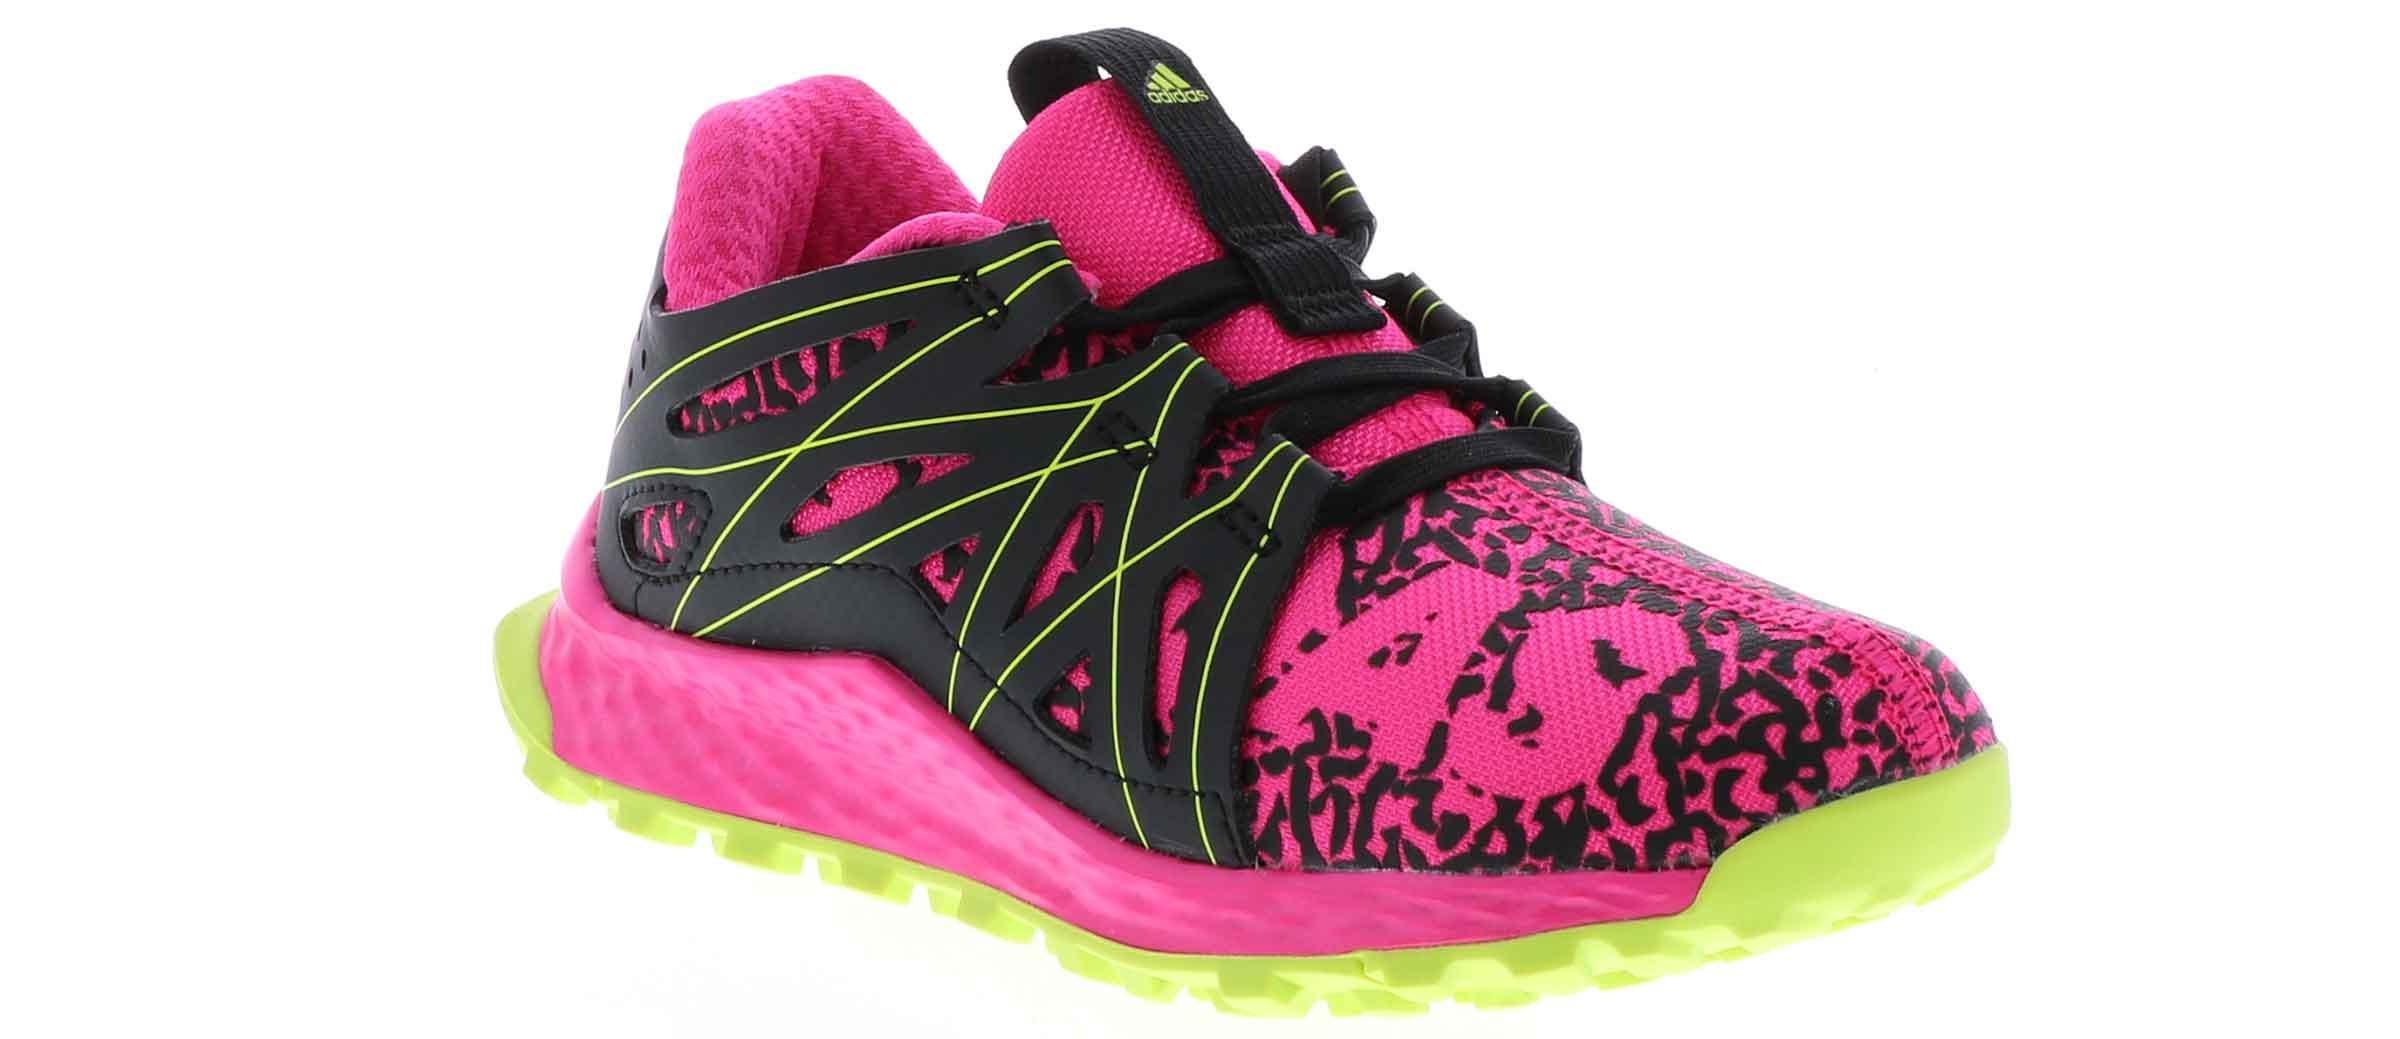 promo code 081a4 800c2 ADIDAS Kid's Adidas Vigor Bounce C (1-3) Athletic Shoes|Shoe ...